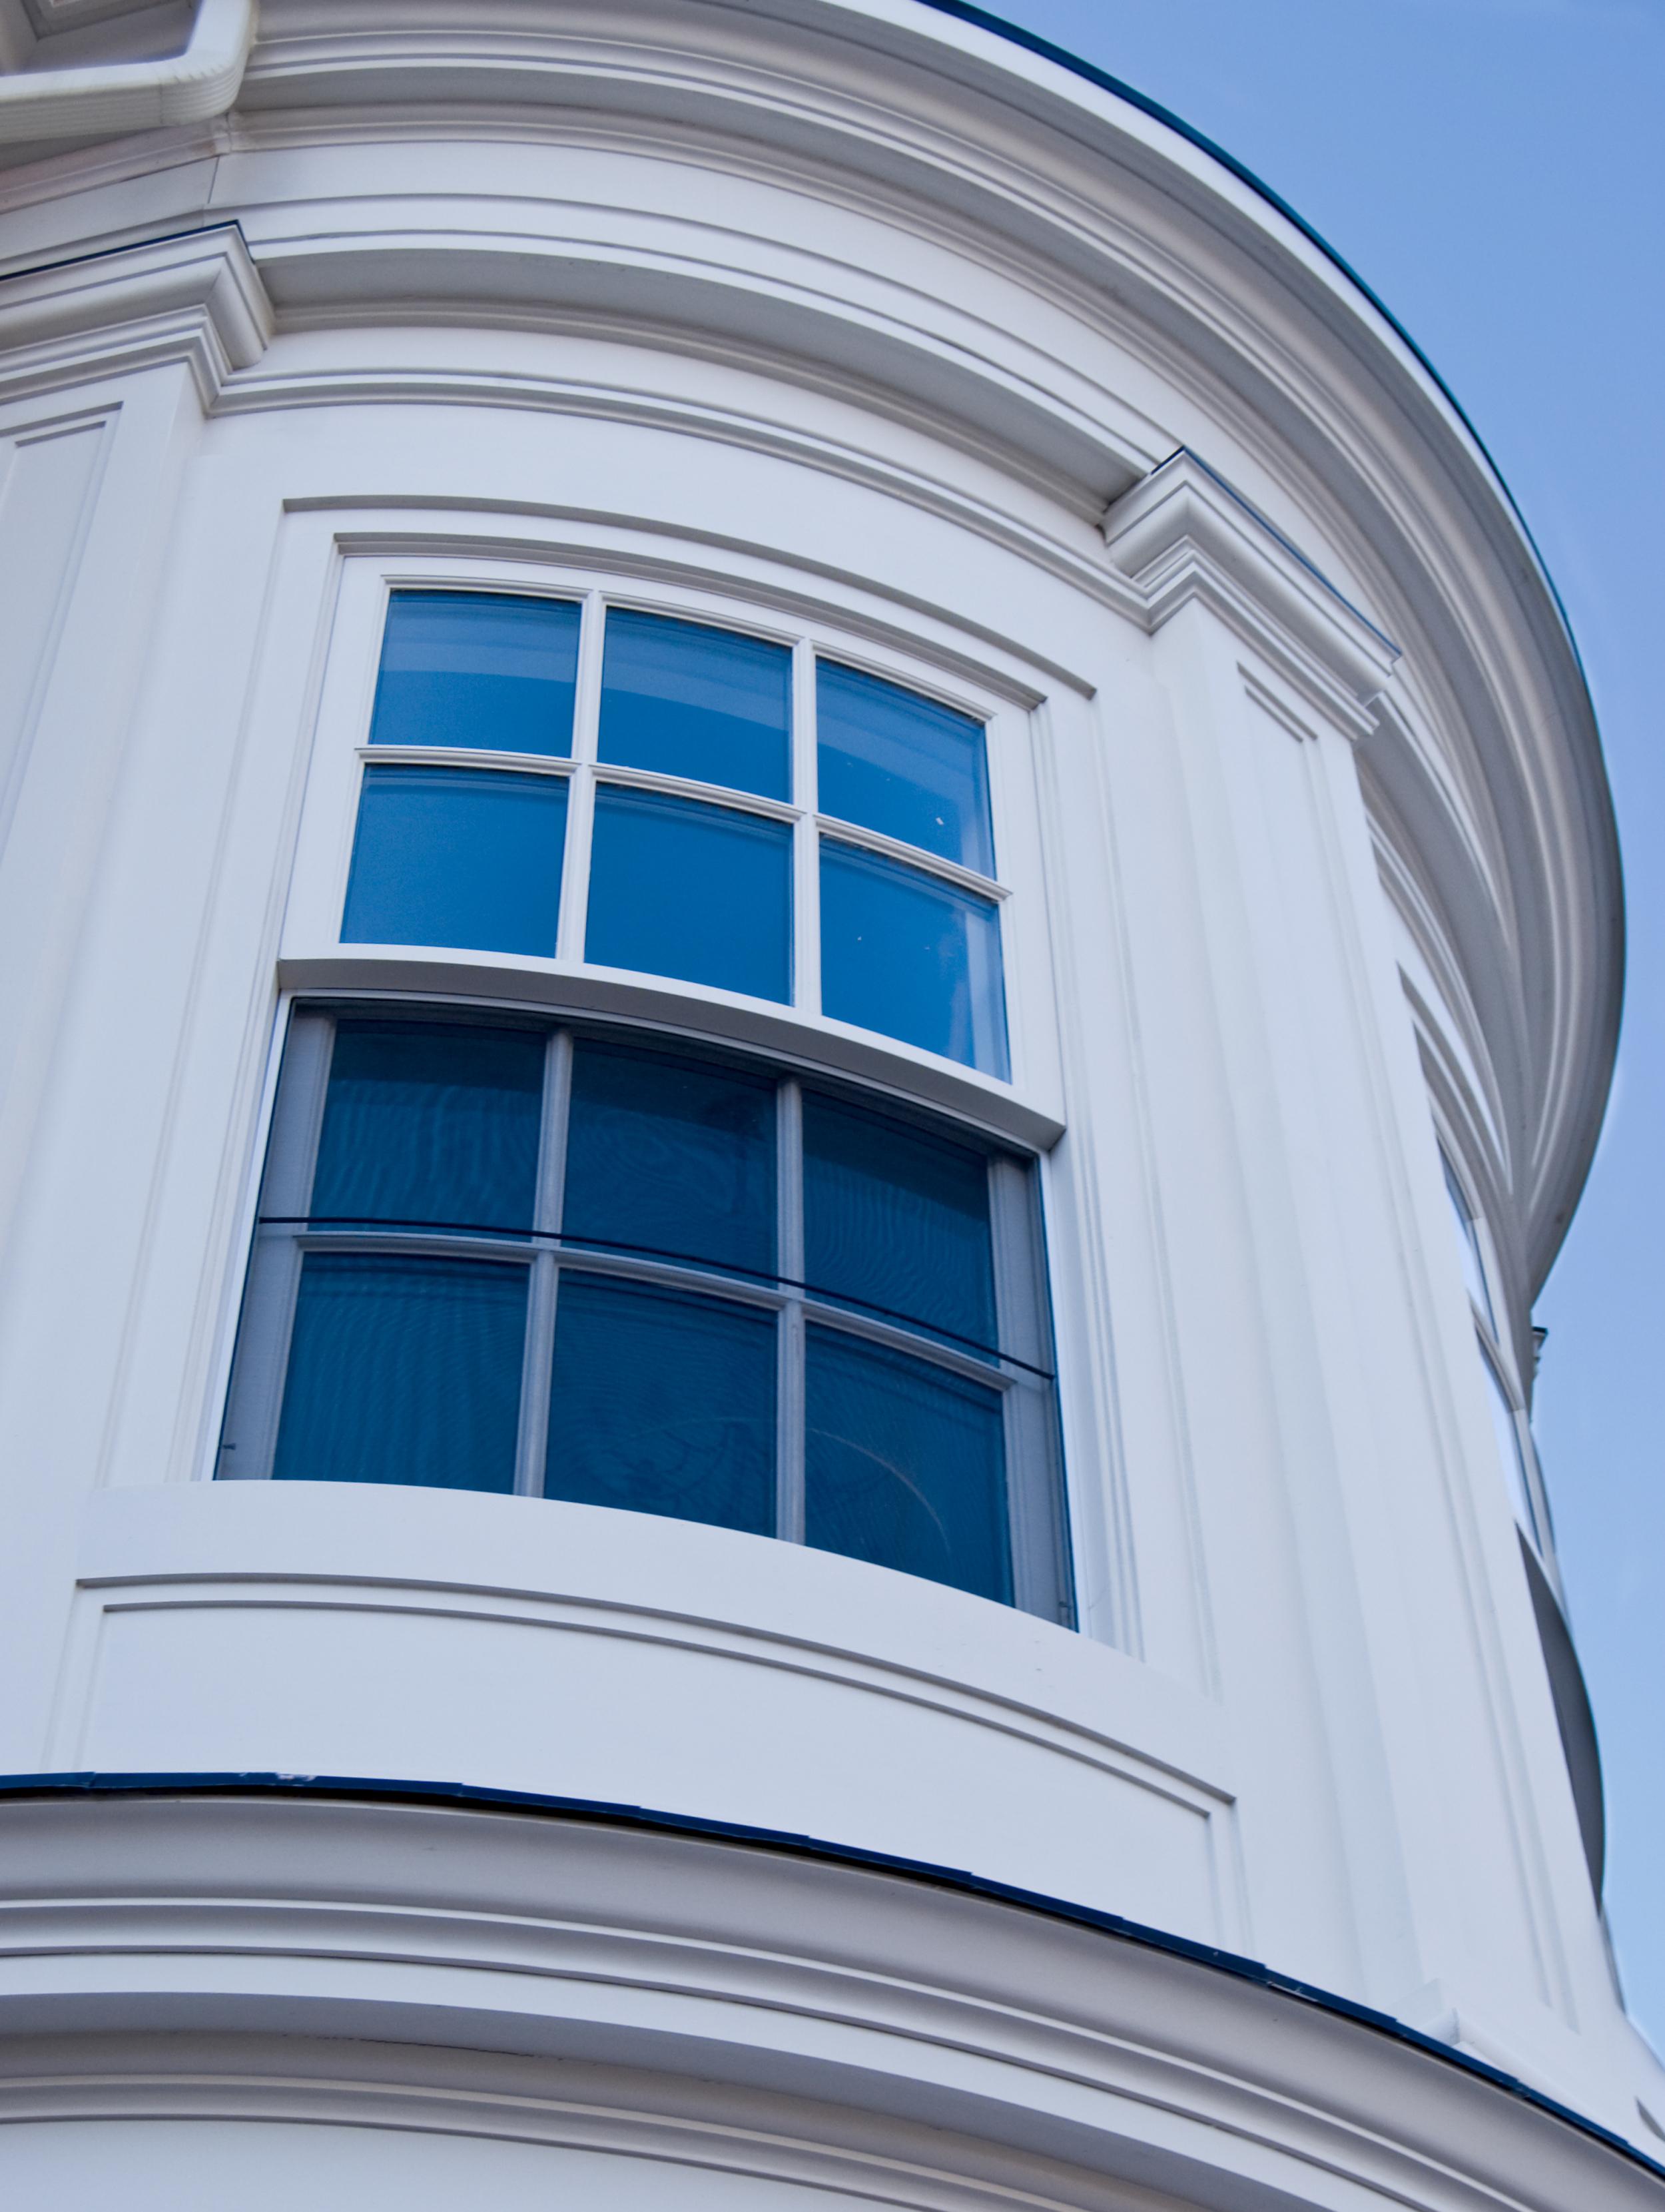 20100128-exterior round window up close-2.jpg